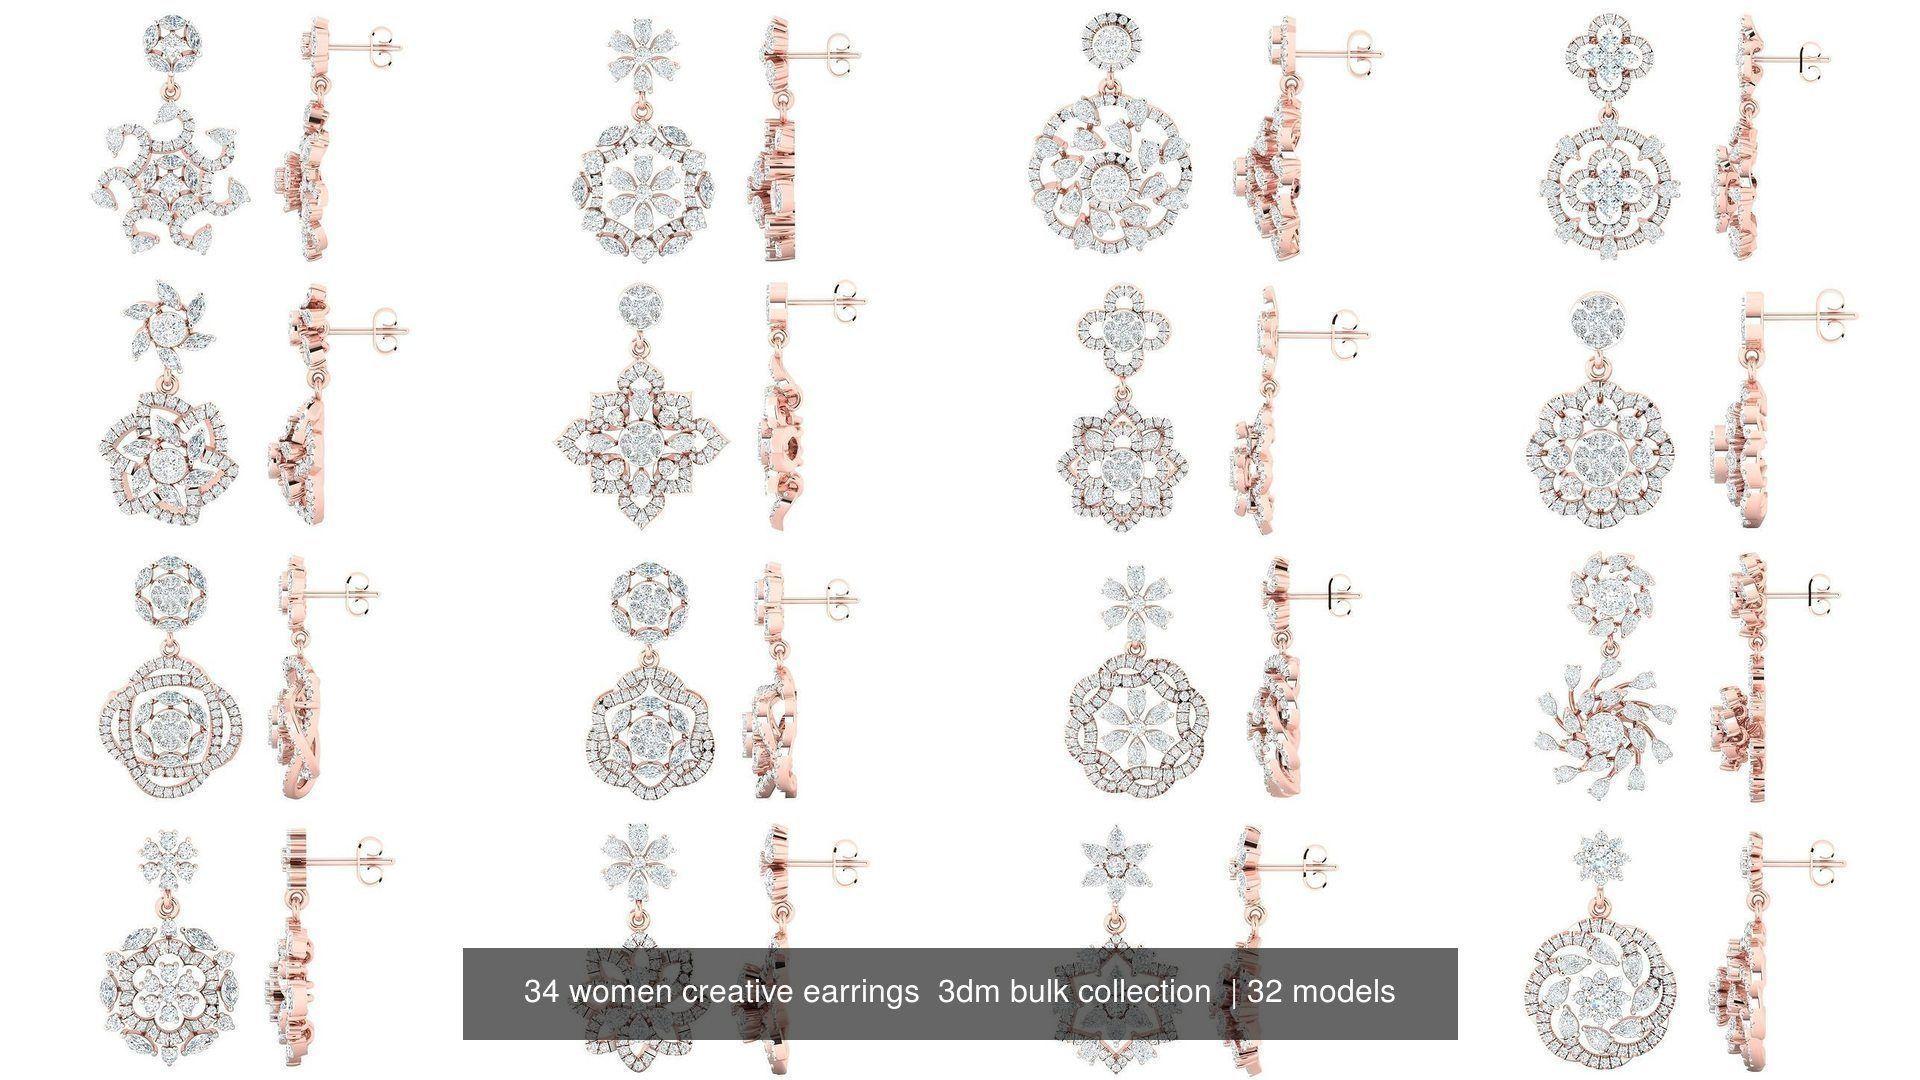 34 women creative earrings  3dm bulk collection